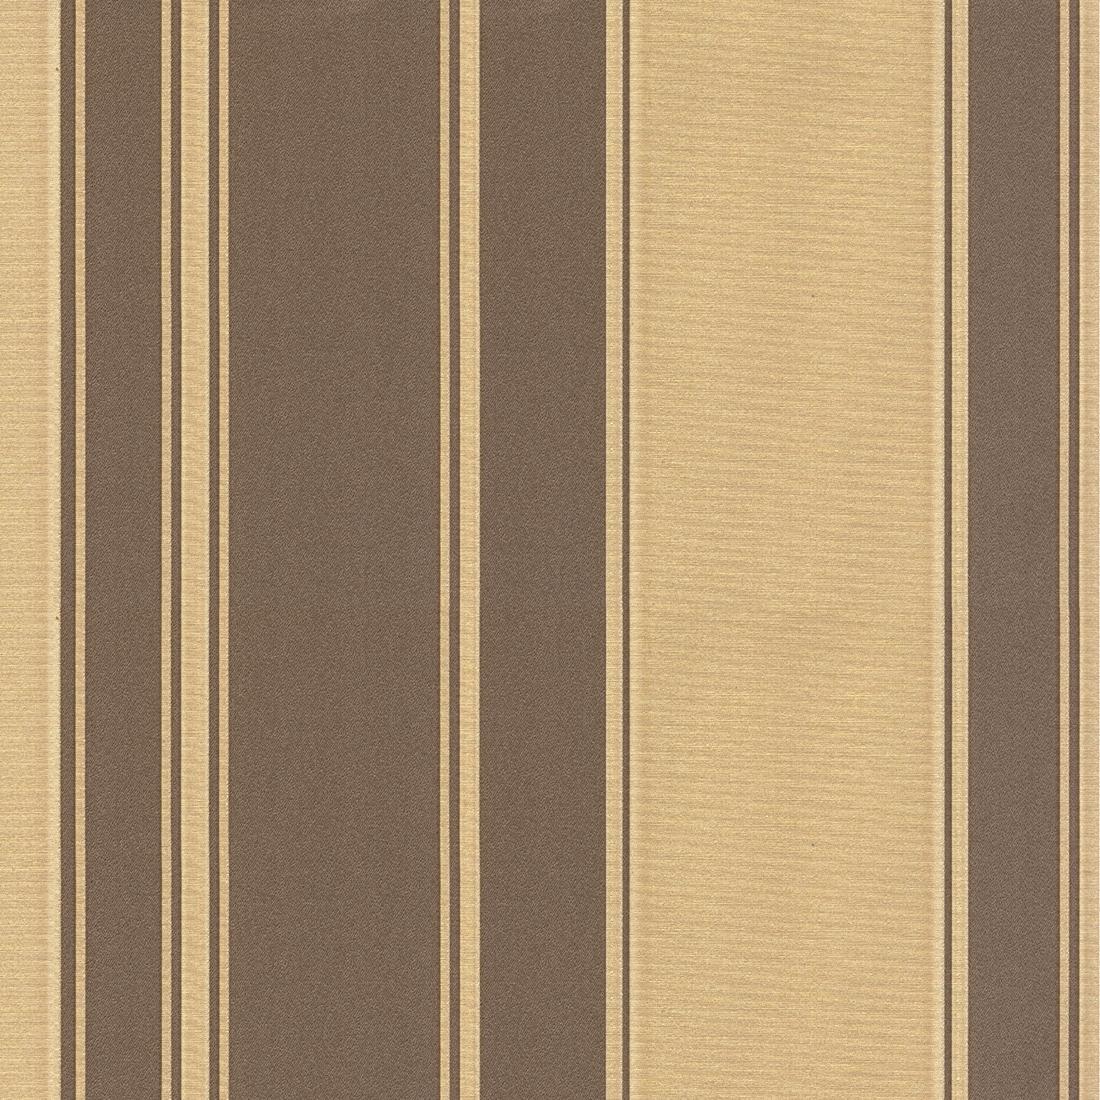 Regency Stripe Brown Gold Wallpaper from Seriano by Belgravia Decor 1100x1100